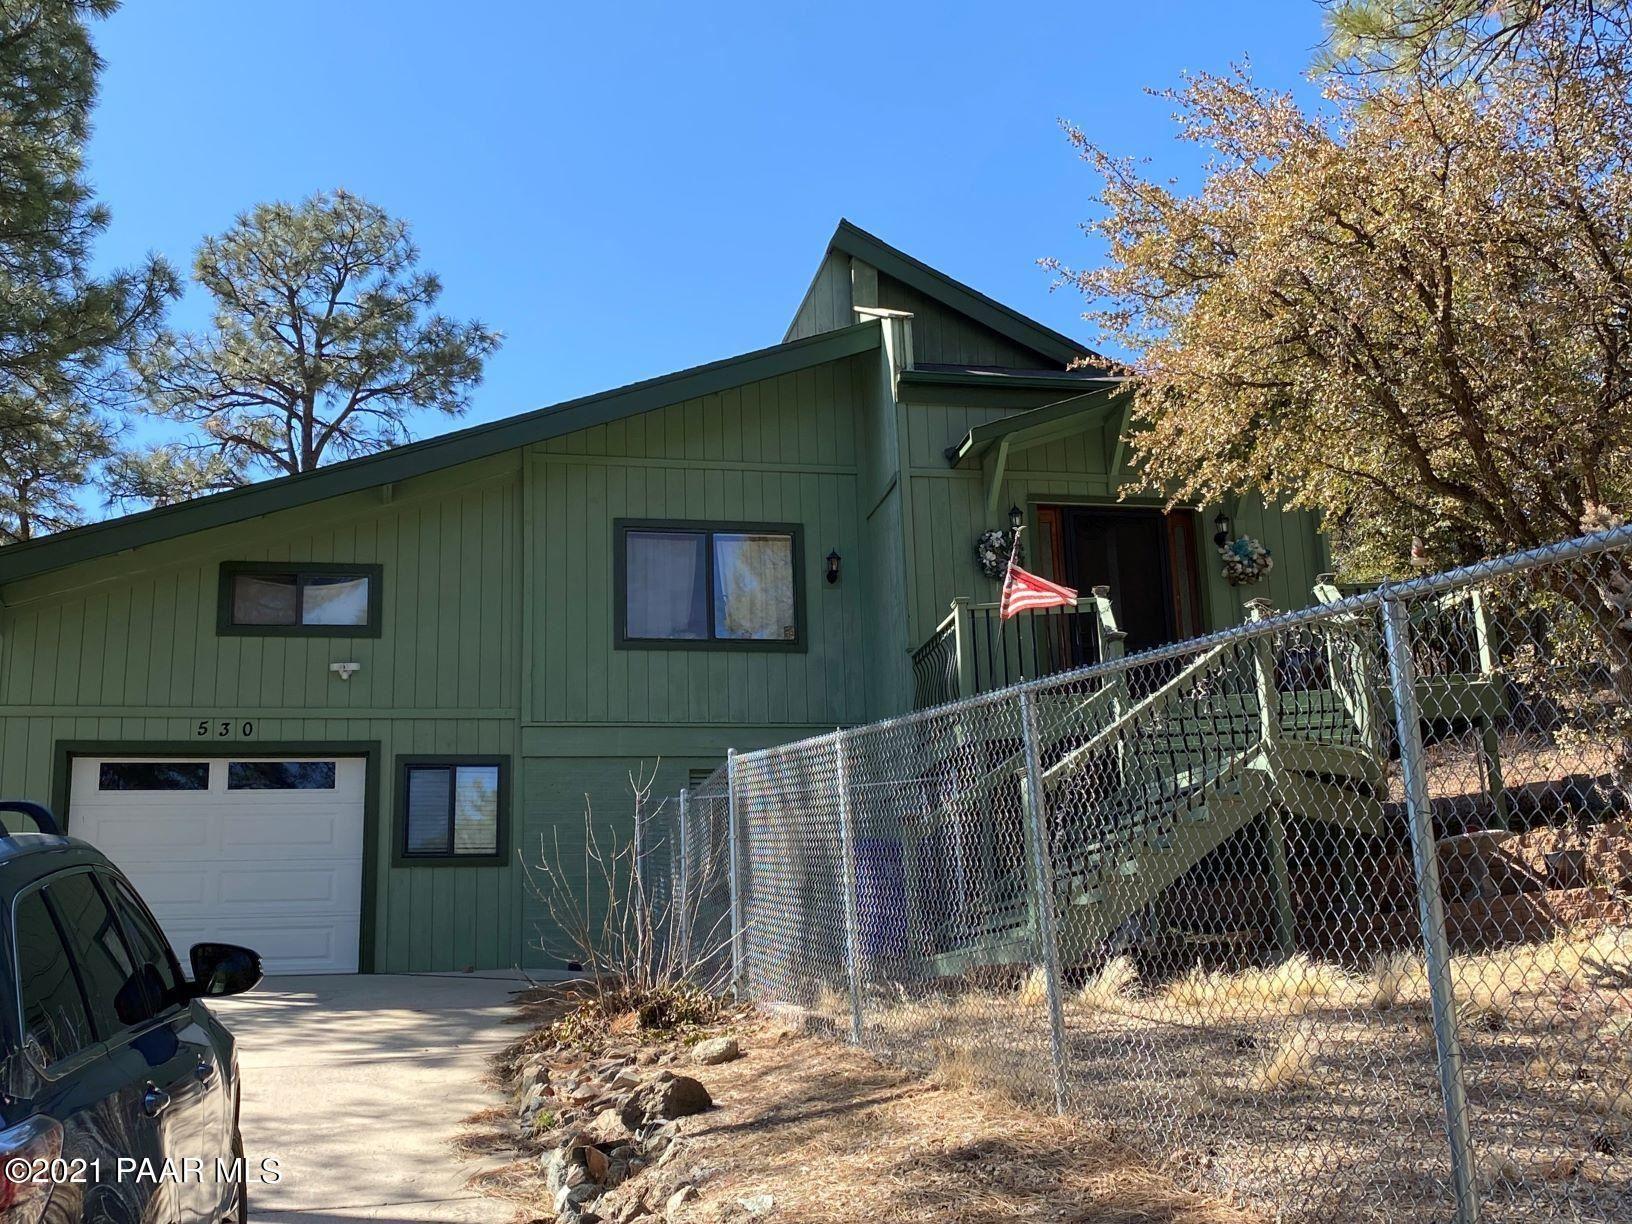 Photo of 530 Woolsey Drive #Lot: 4, Prescott, AZ 86303 (MLS # 1037562)